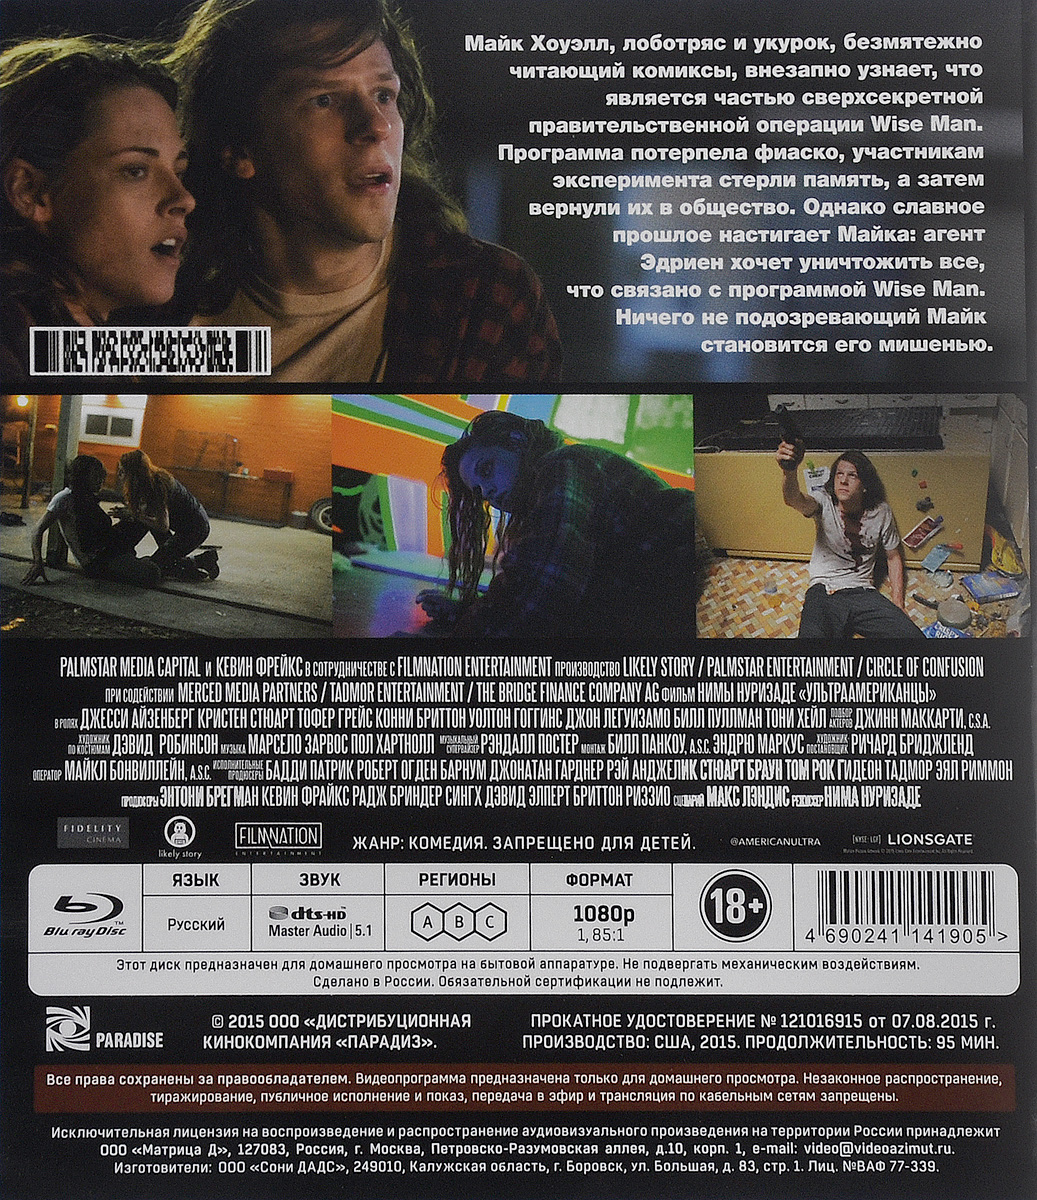 Ультраамериканцы (Blu-ray) Bridge Finance Company,Circle of Confusion,FilmNation Entertainment,Likely Story,Merced Media Partners,Palm-Star Entertainment